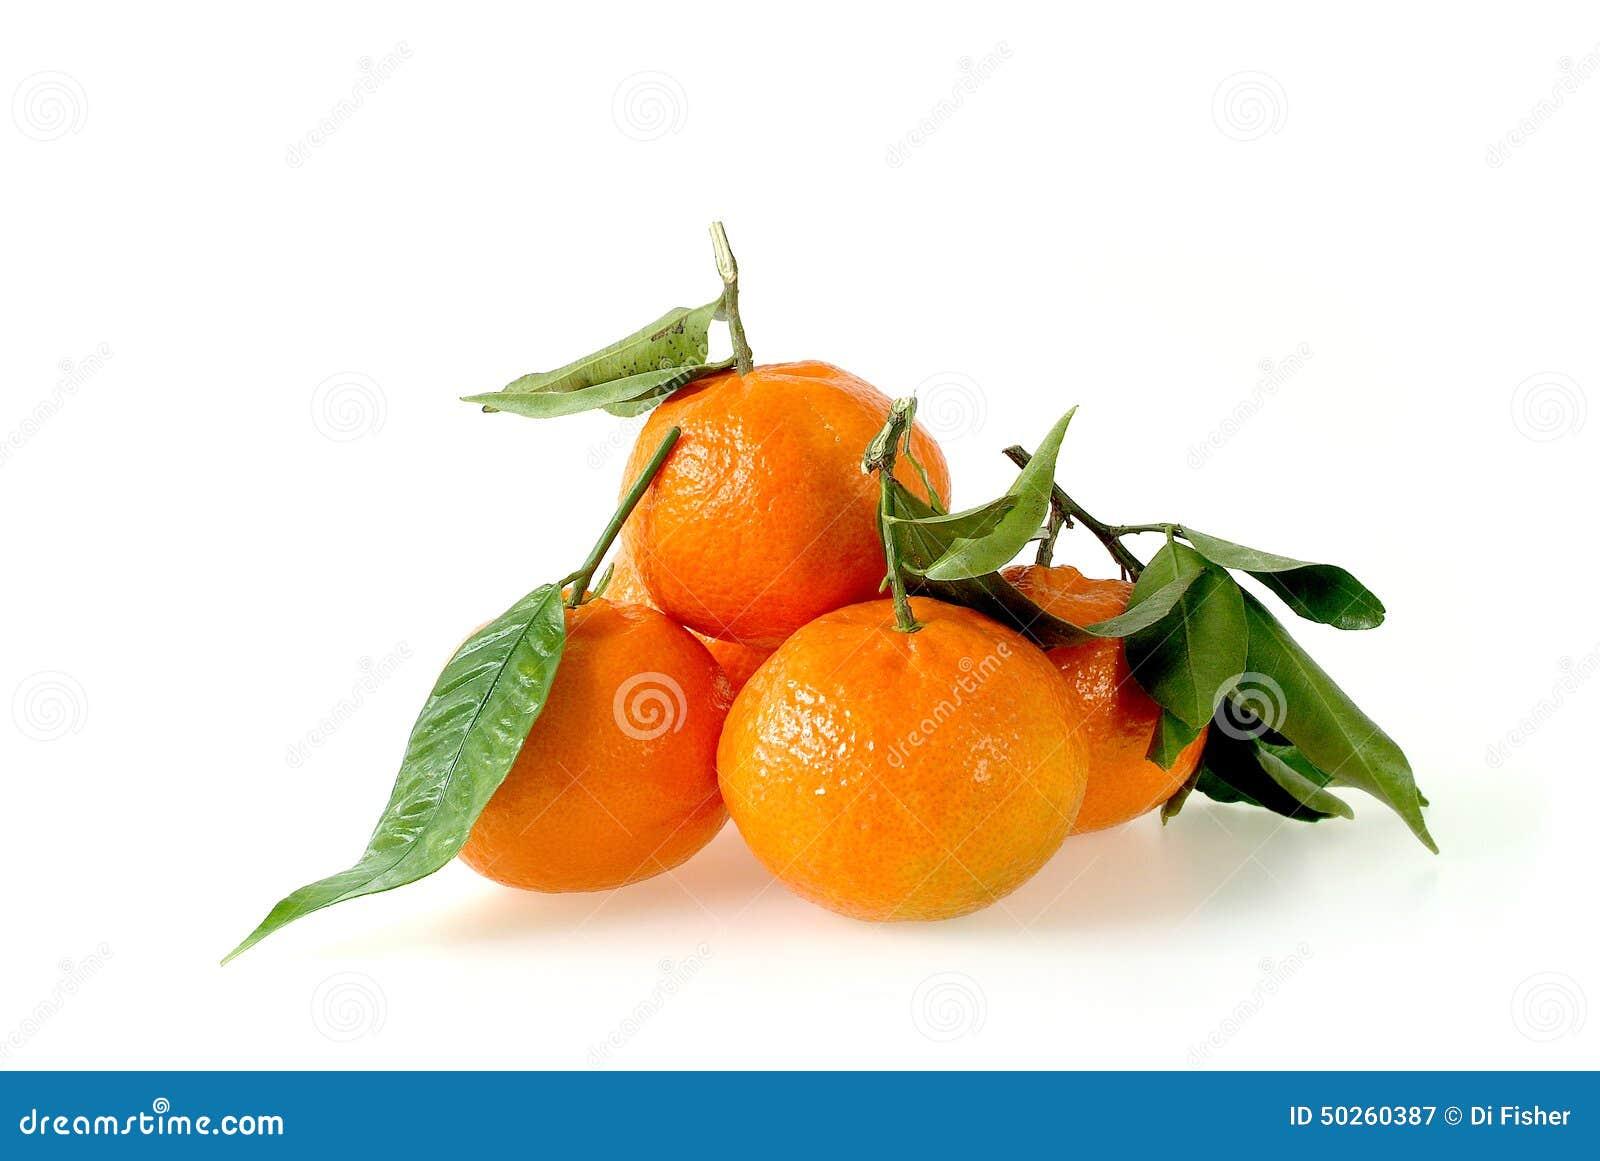 clementine fruit avec des feuilles photo stock image 50260387. Black Bedroom Furniture Sets. Home Design Ideas